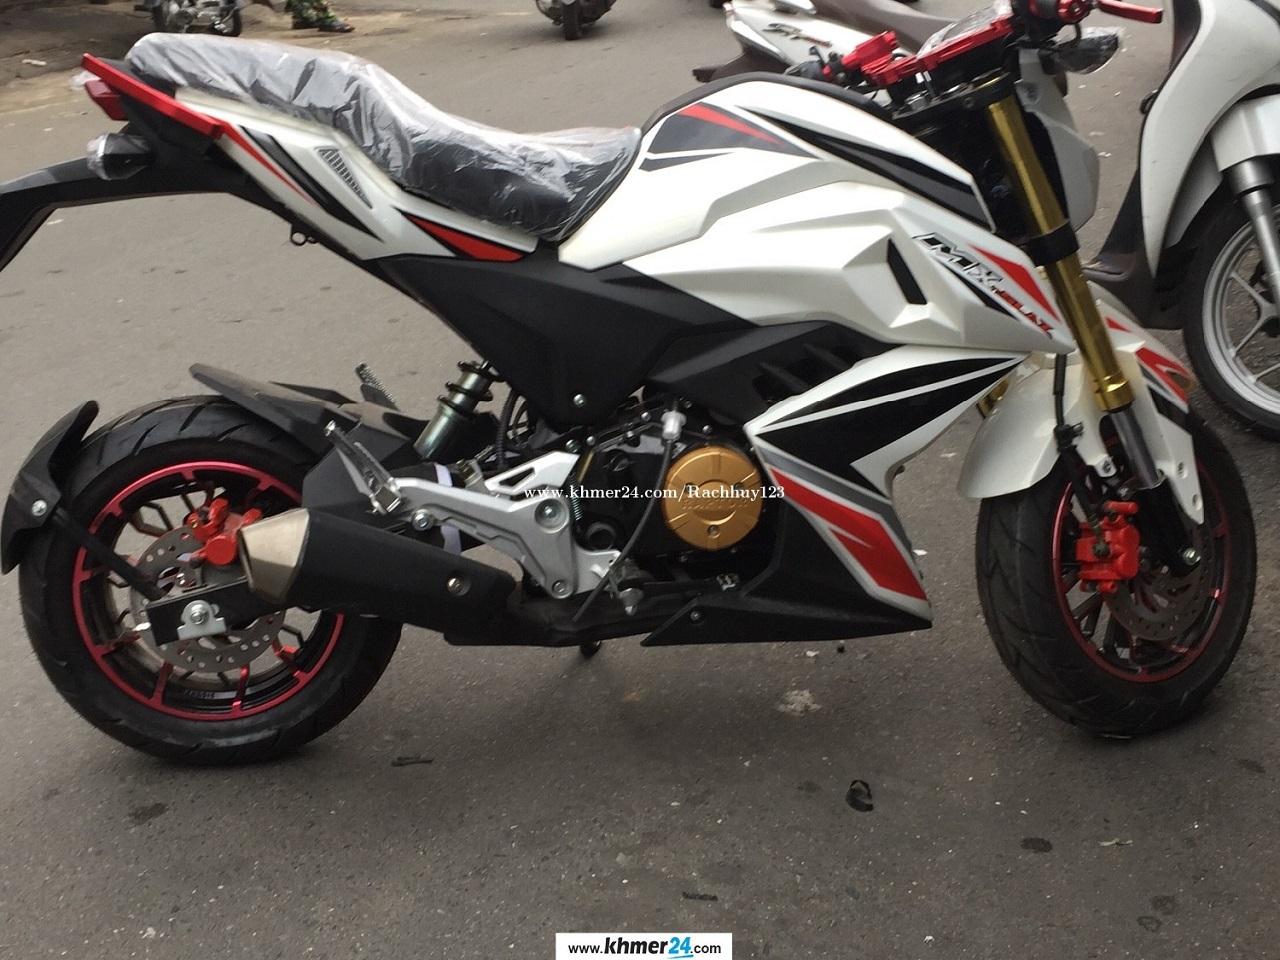 Yamaha-TFX-nhai-du-biker-Viet-voi-gia-re-hon-62-trieu-dong-anh-4